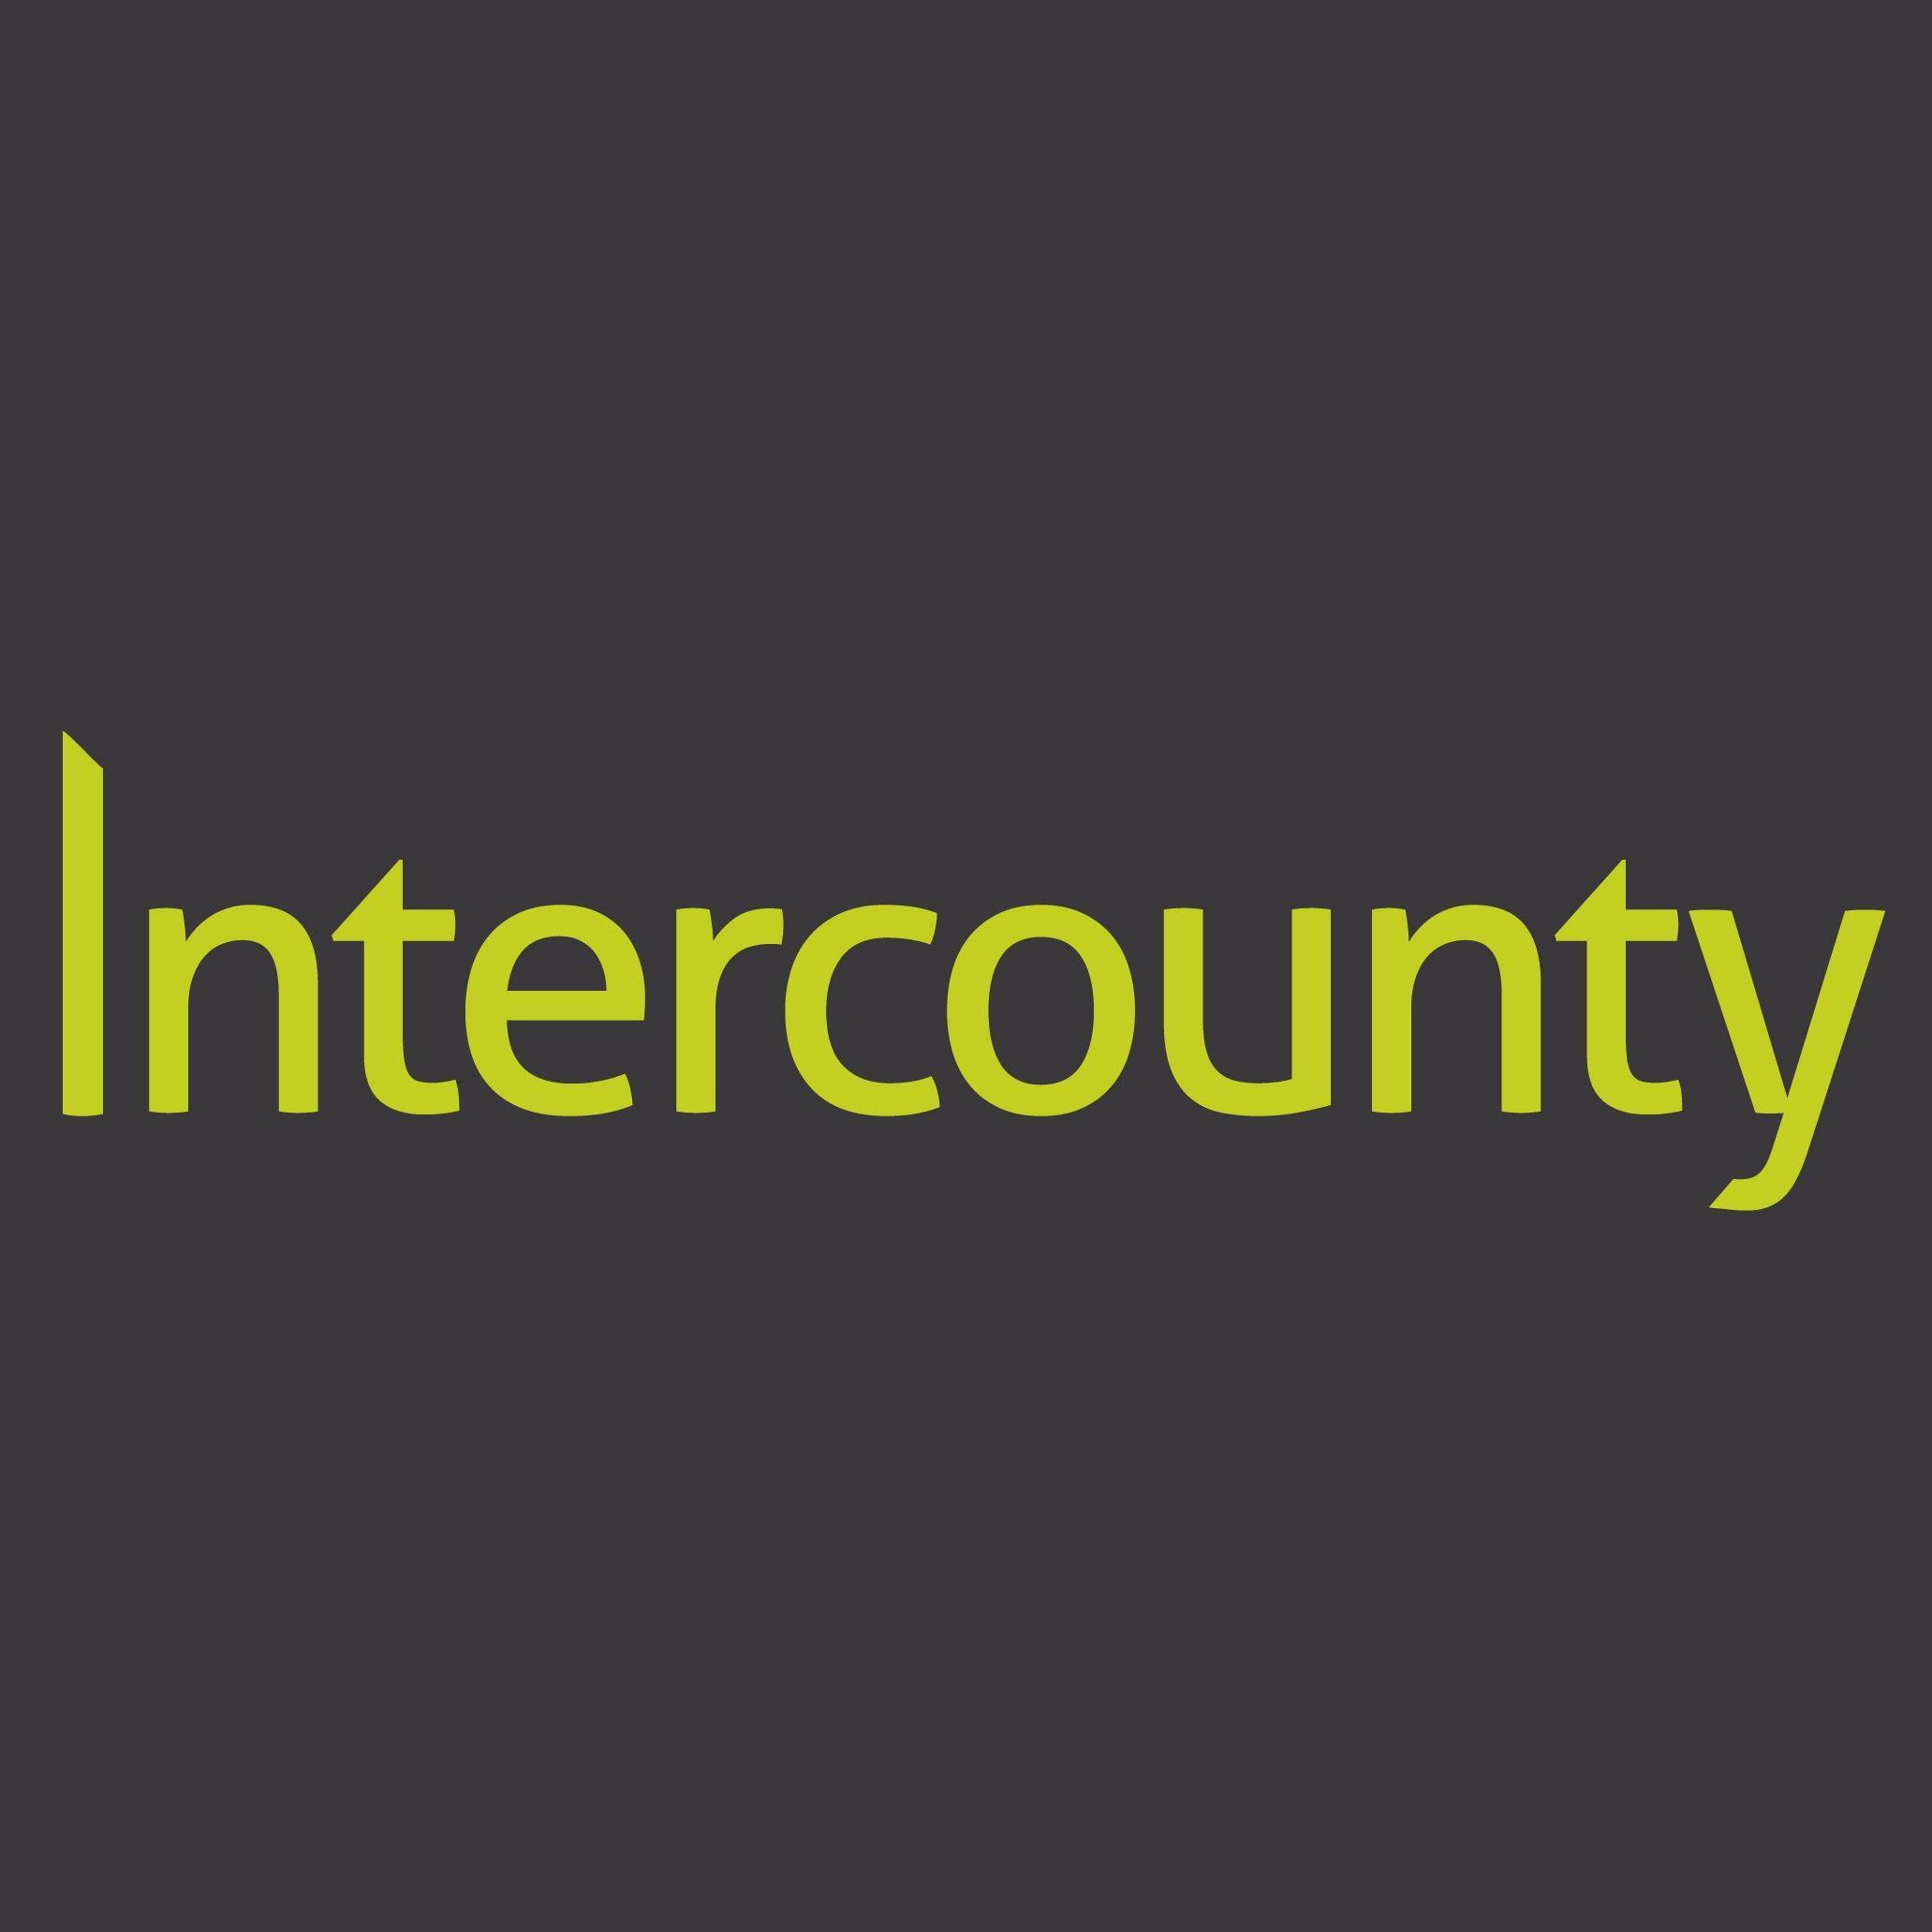 Intercounty Royston - Royston, Hertfordshire SG8 7BP - 01763 242528 | ShowMeLocal.com